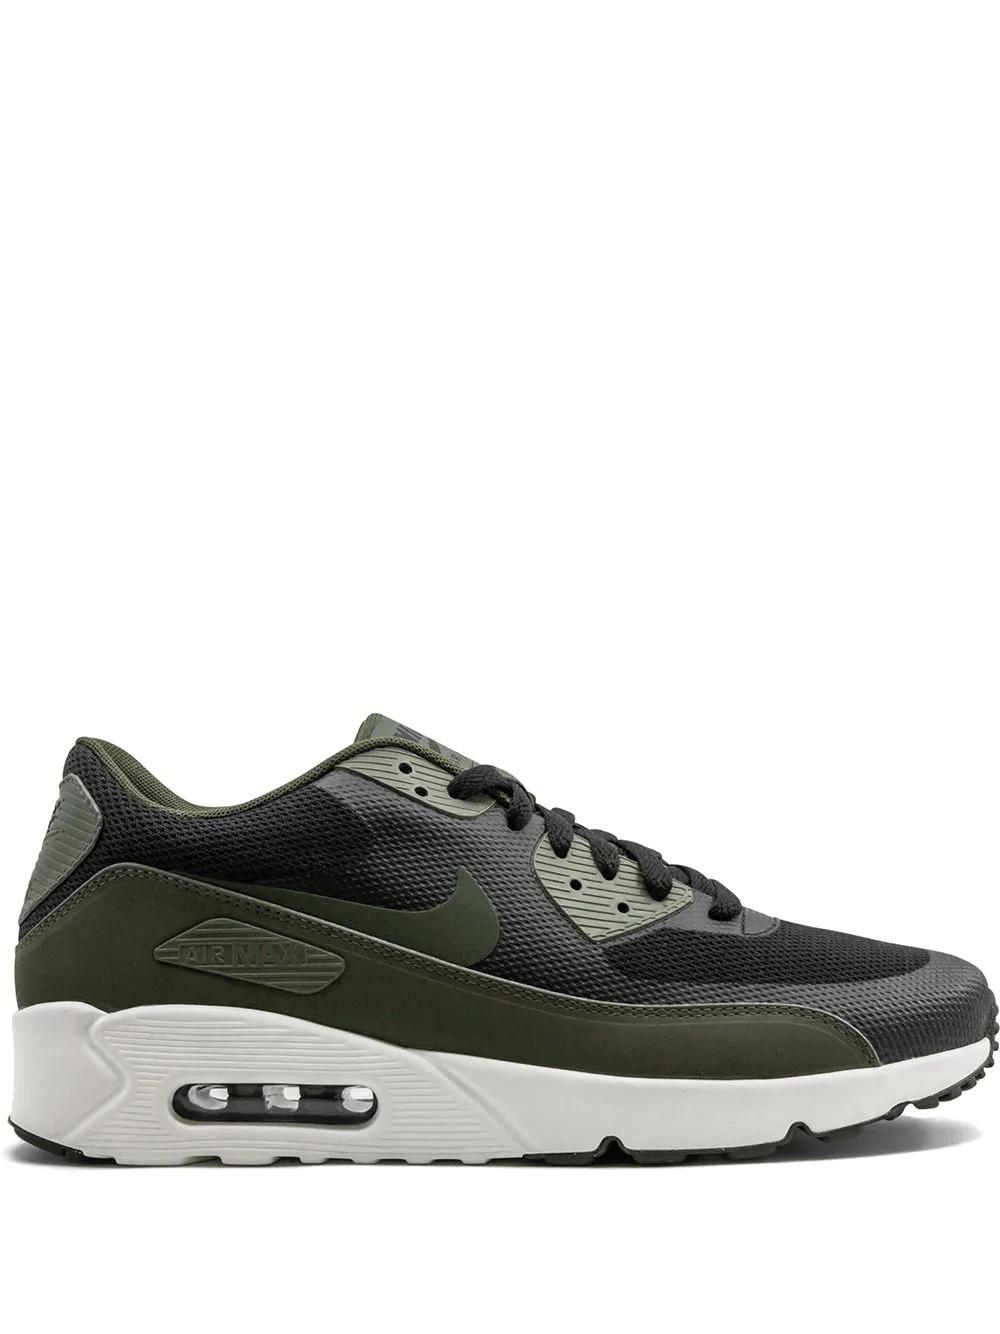 4a3c48cfcc169 Nike 'Air Max 90 Ultra 2.0' Sneakers - Schwarz In Black   ModeSens